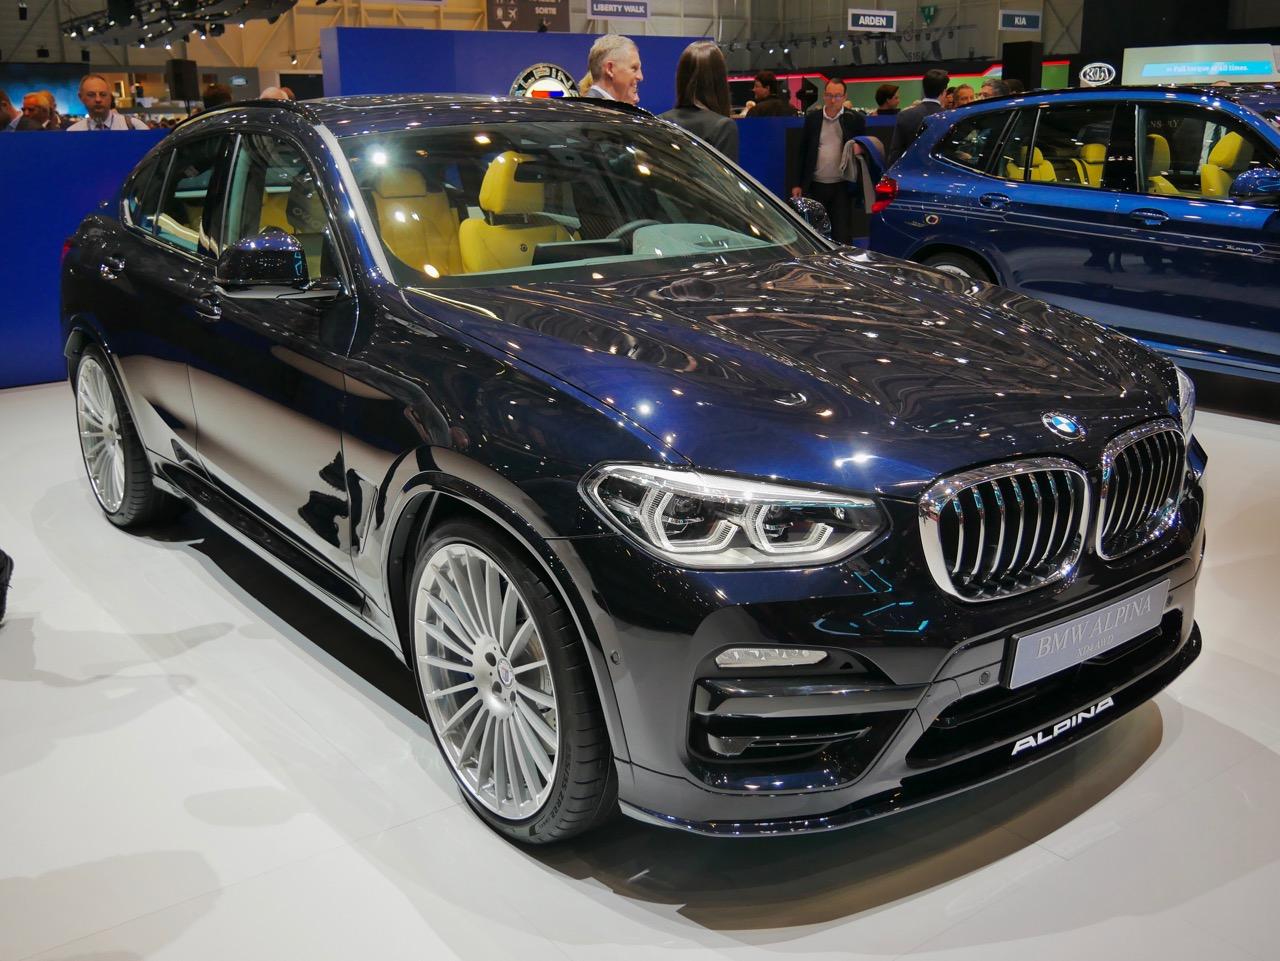 2018 Alpina XD4.